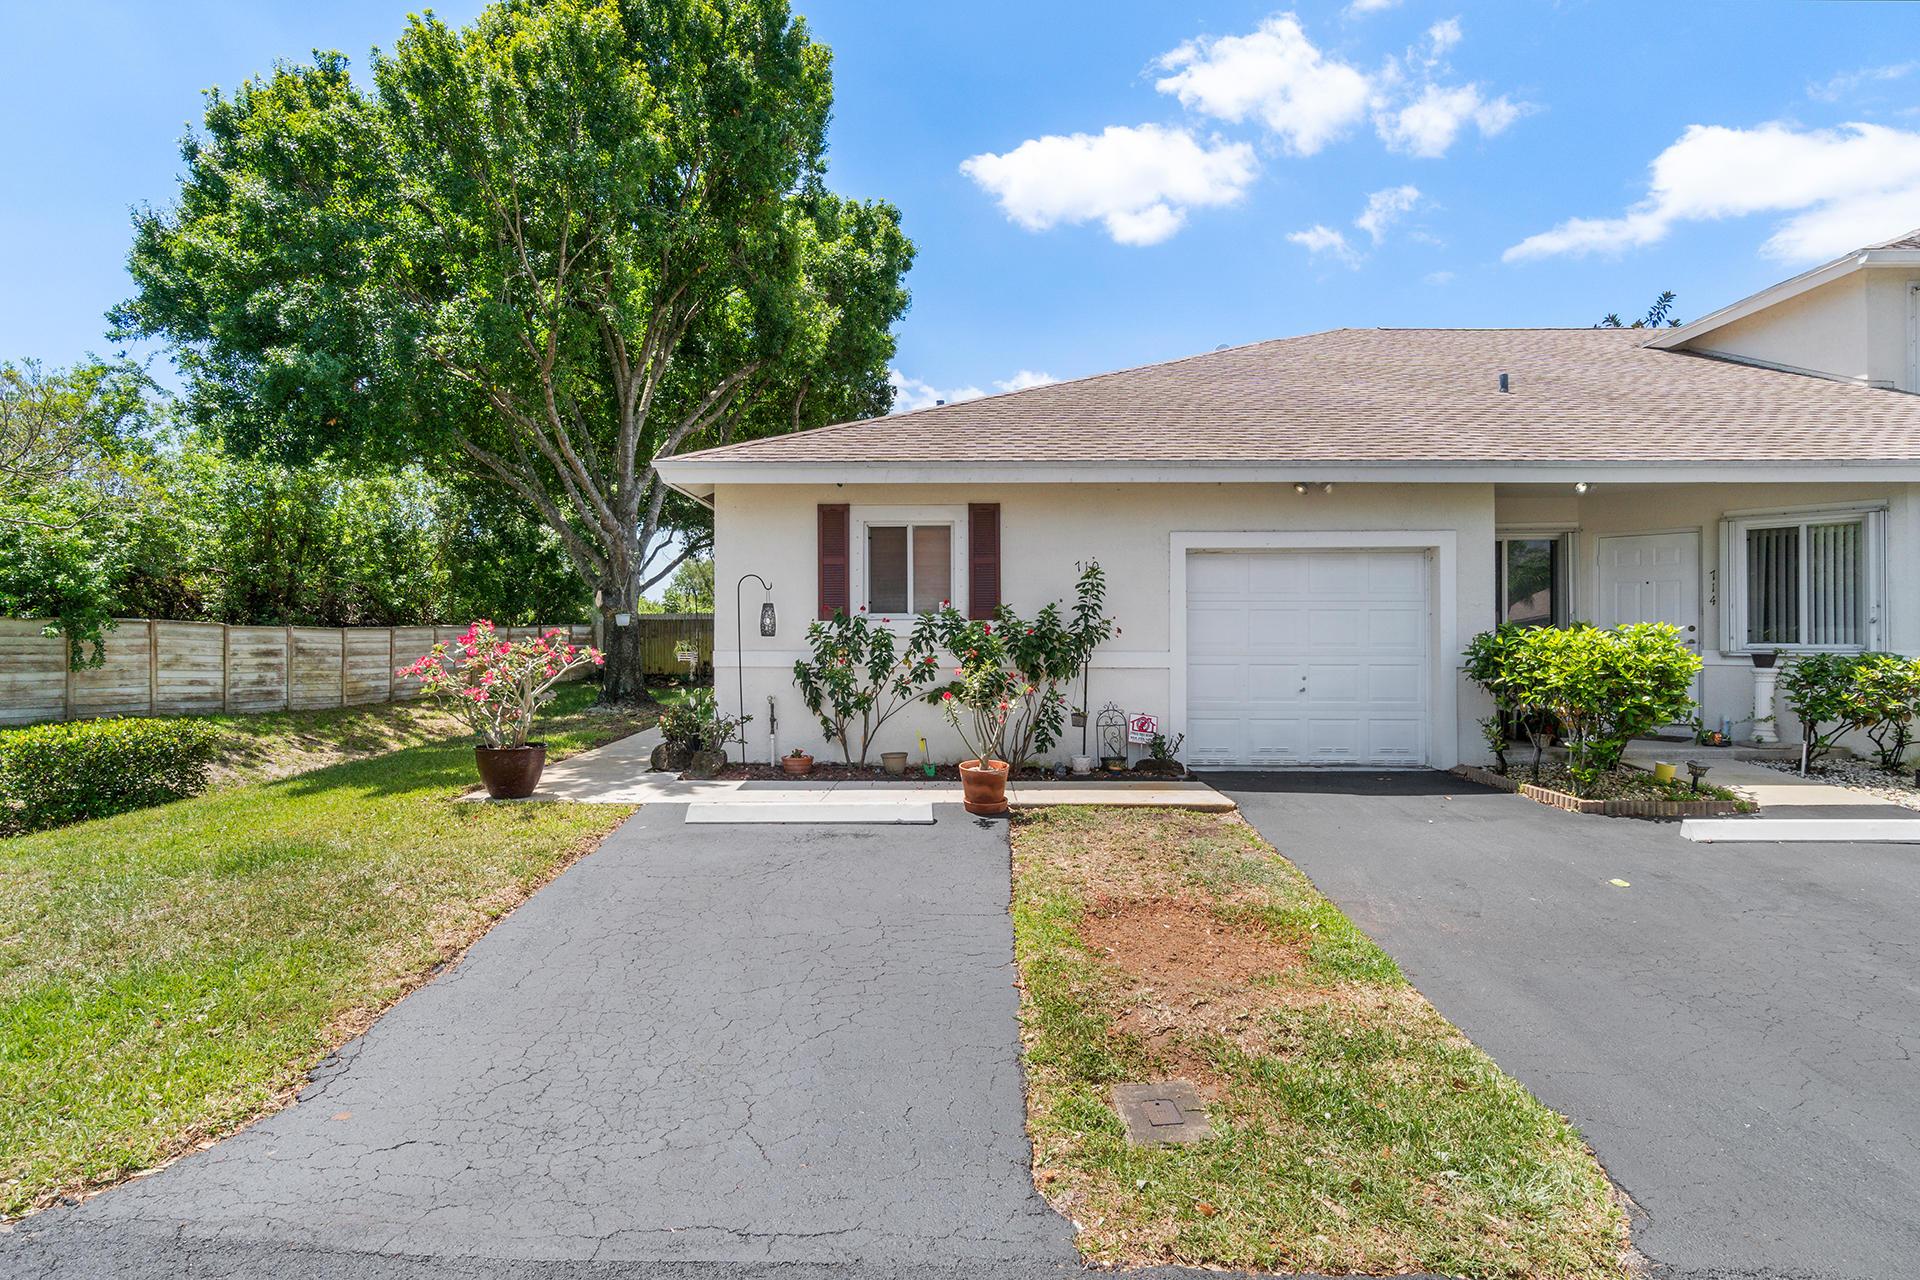 Home for sale in Crystal Lake Village Deerfield Beach Florida